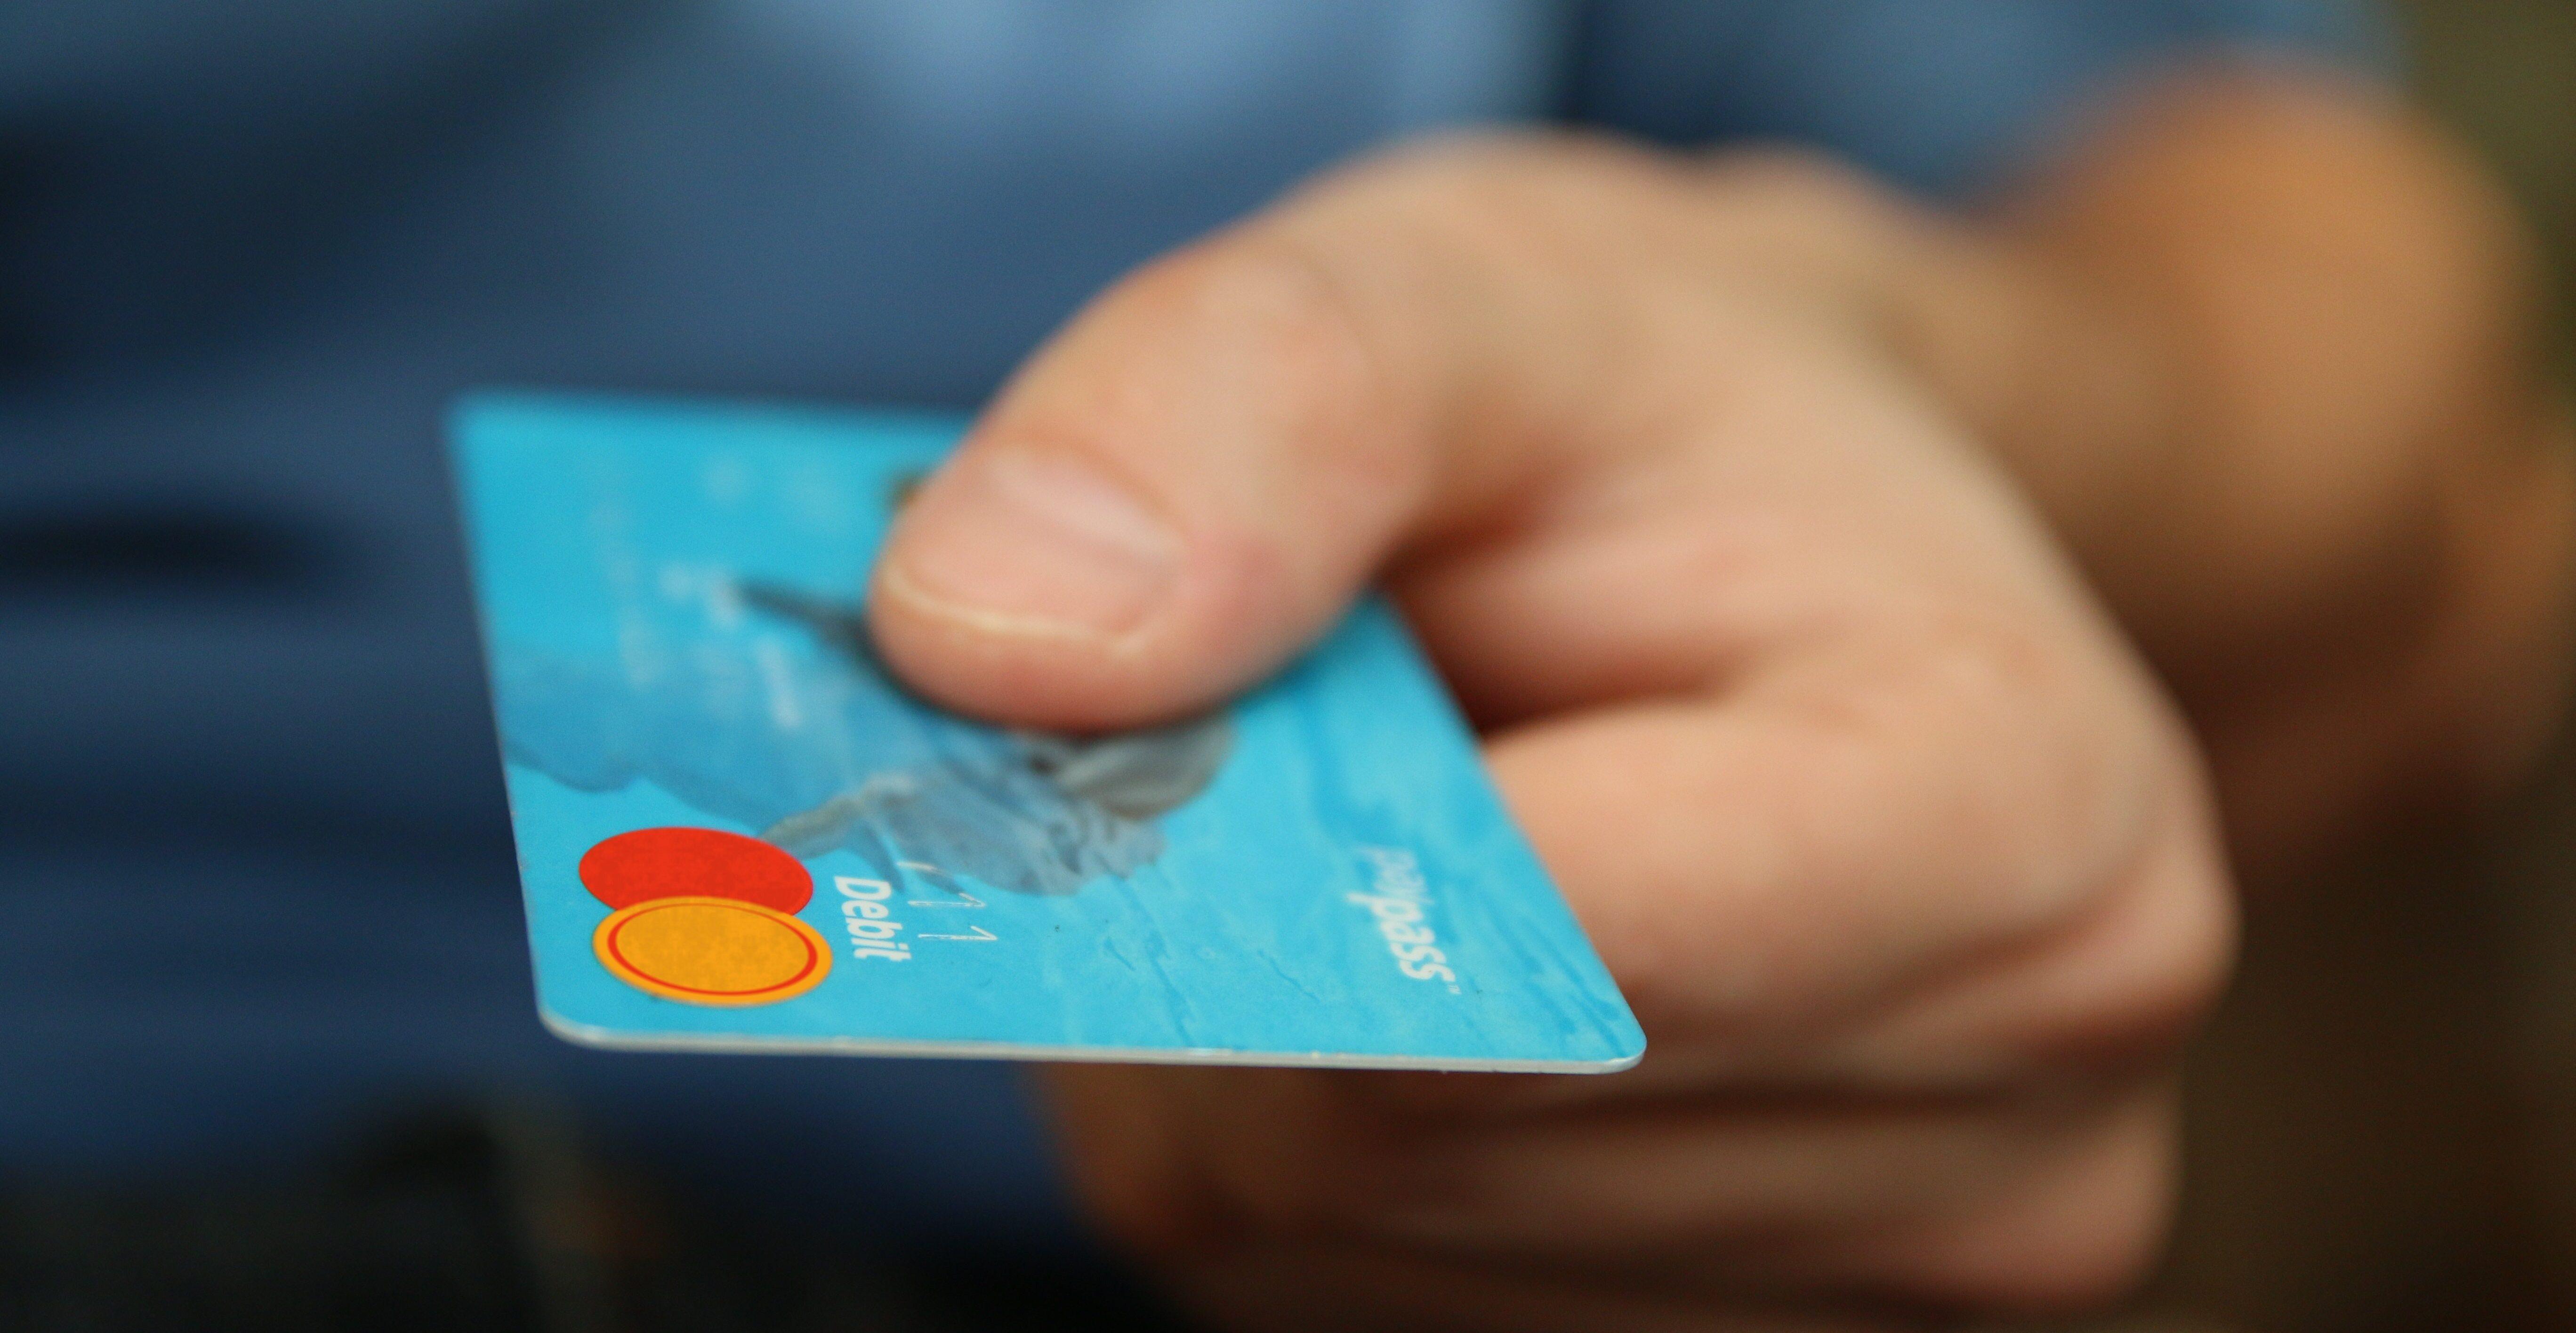 Blåt debit kredit kort